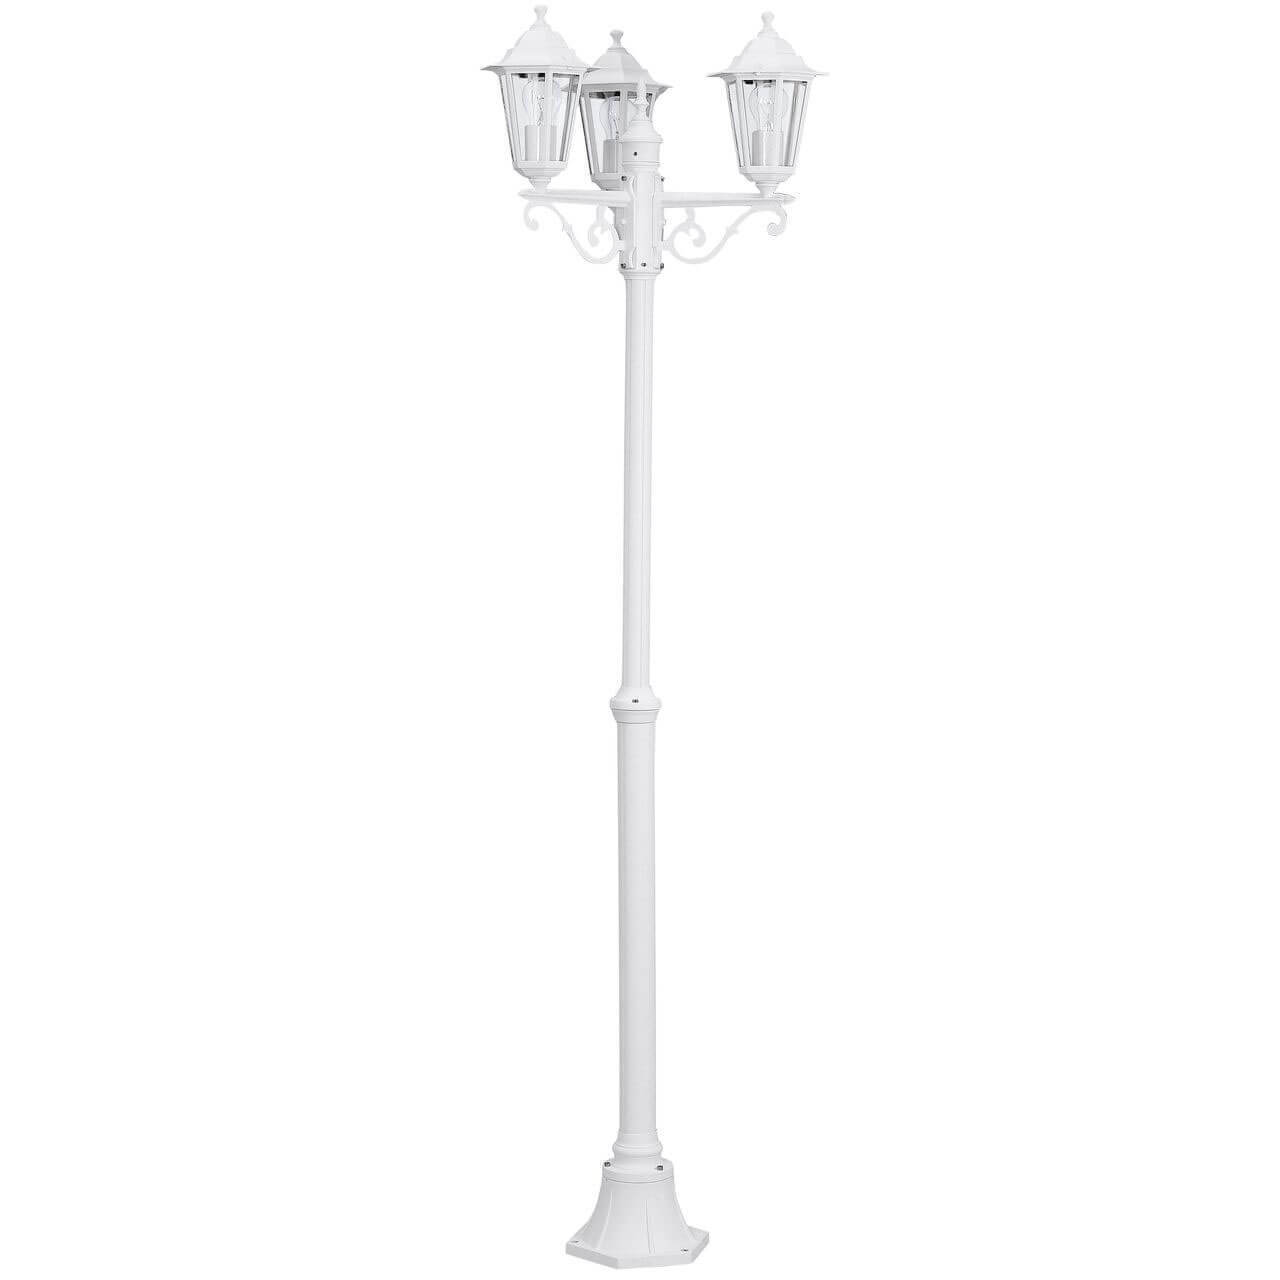 Садово-парковый светильник Eglo Laterna 4 22996 eglo 22996